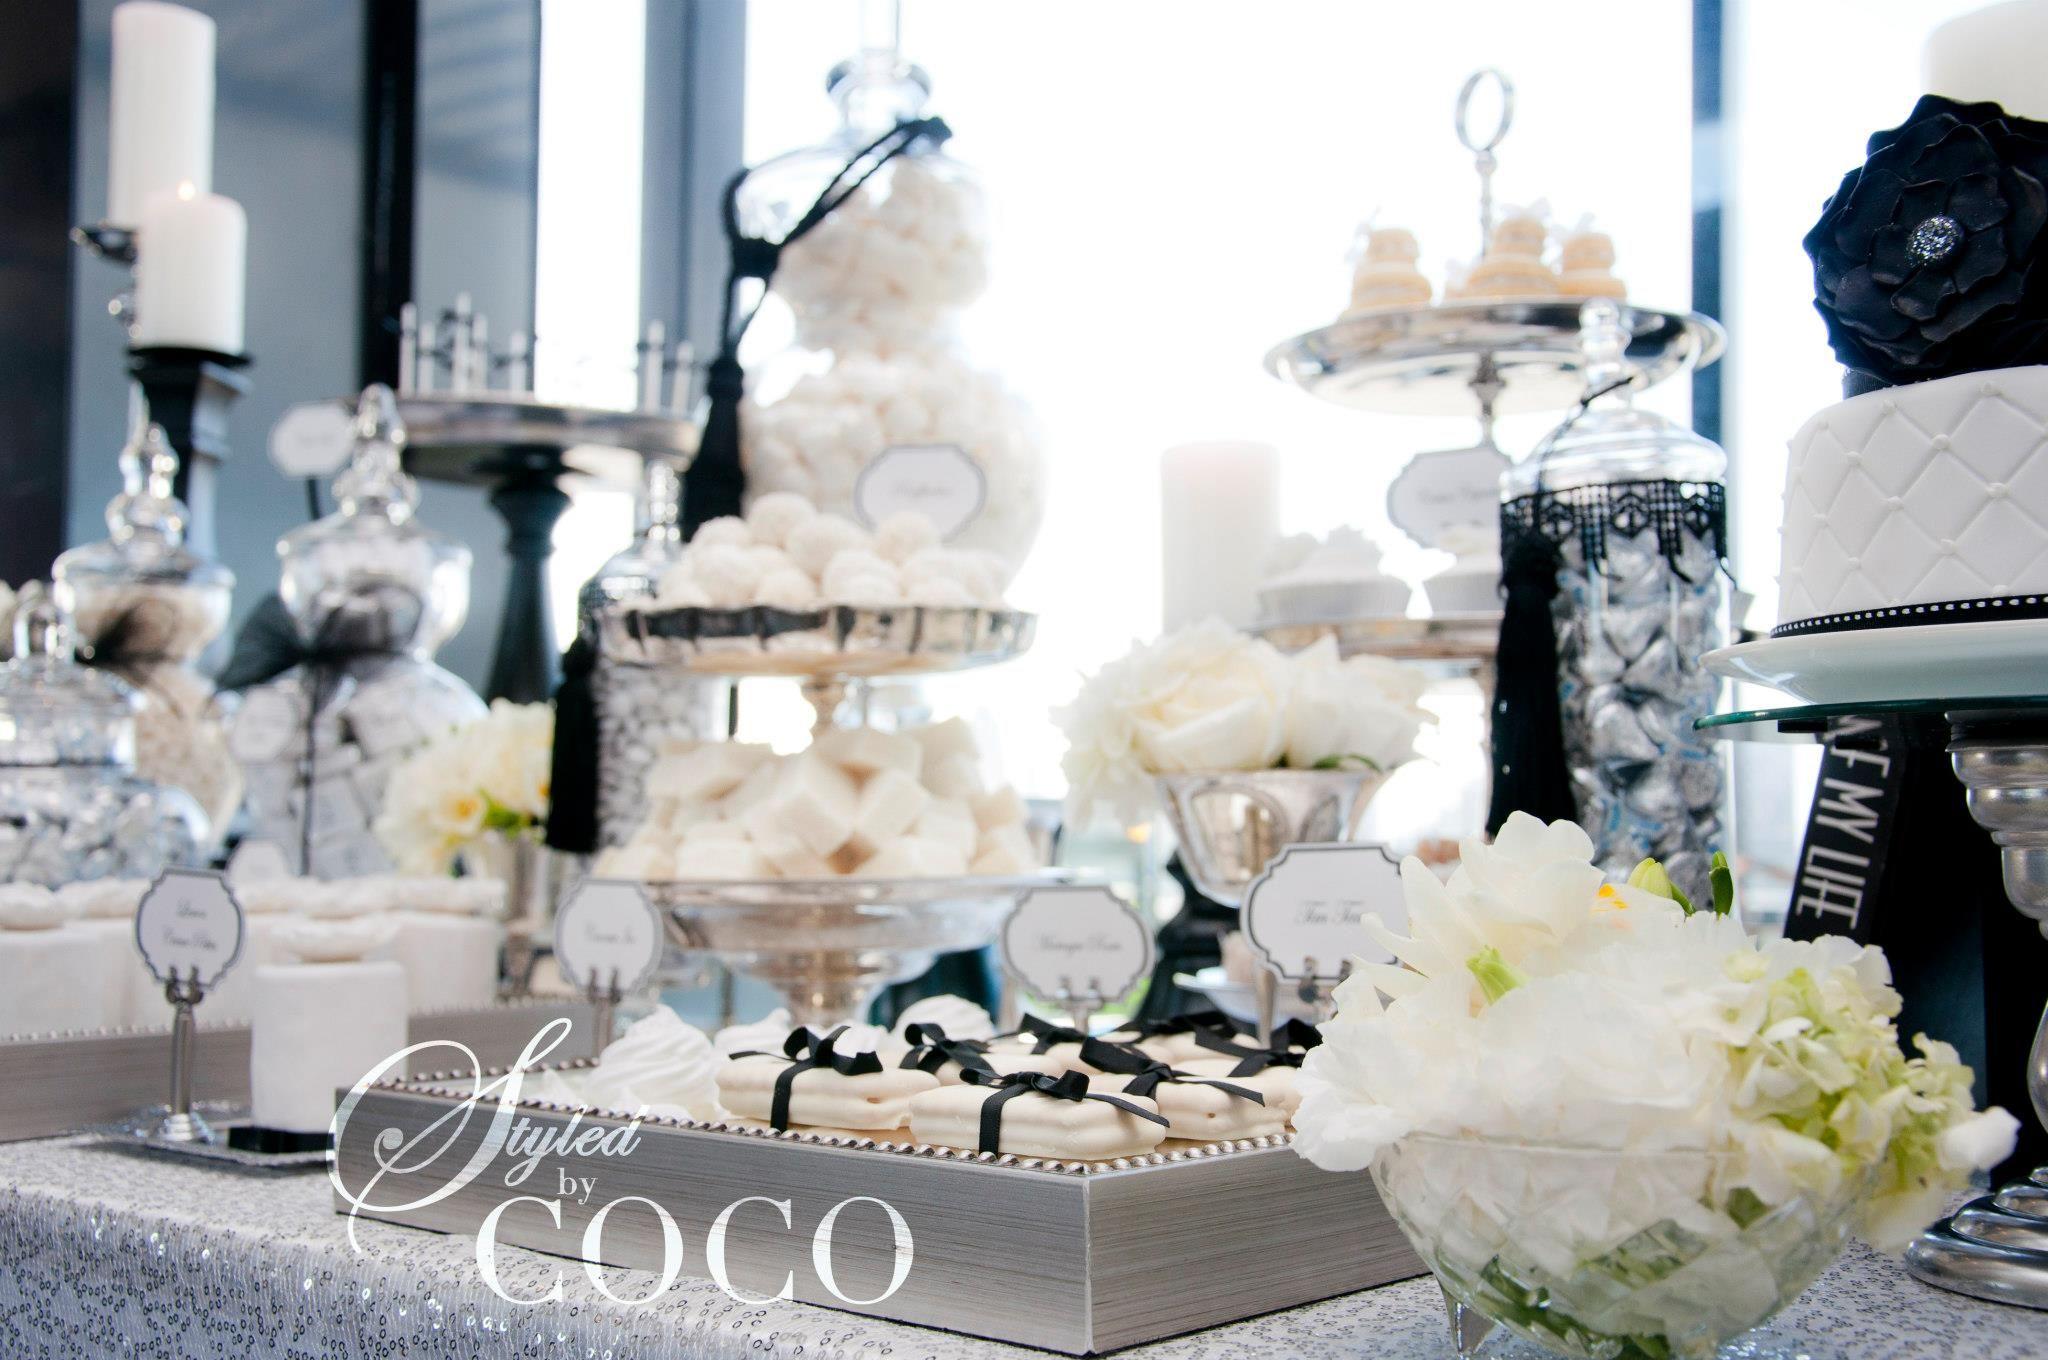 Black & White French Wedding Dessert Table | Pinterest | French ...